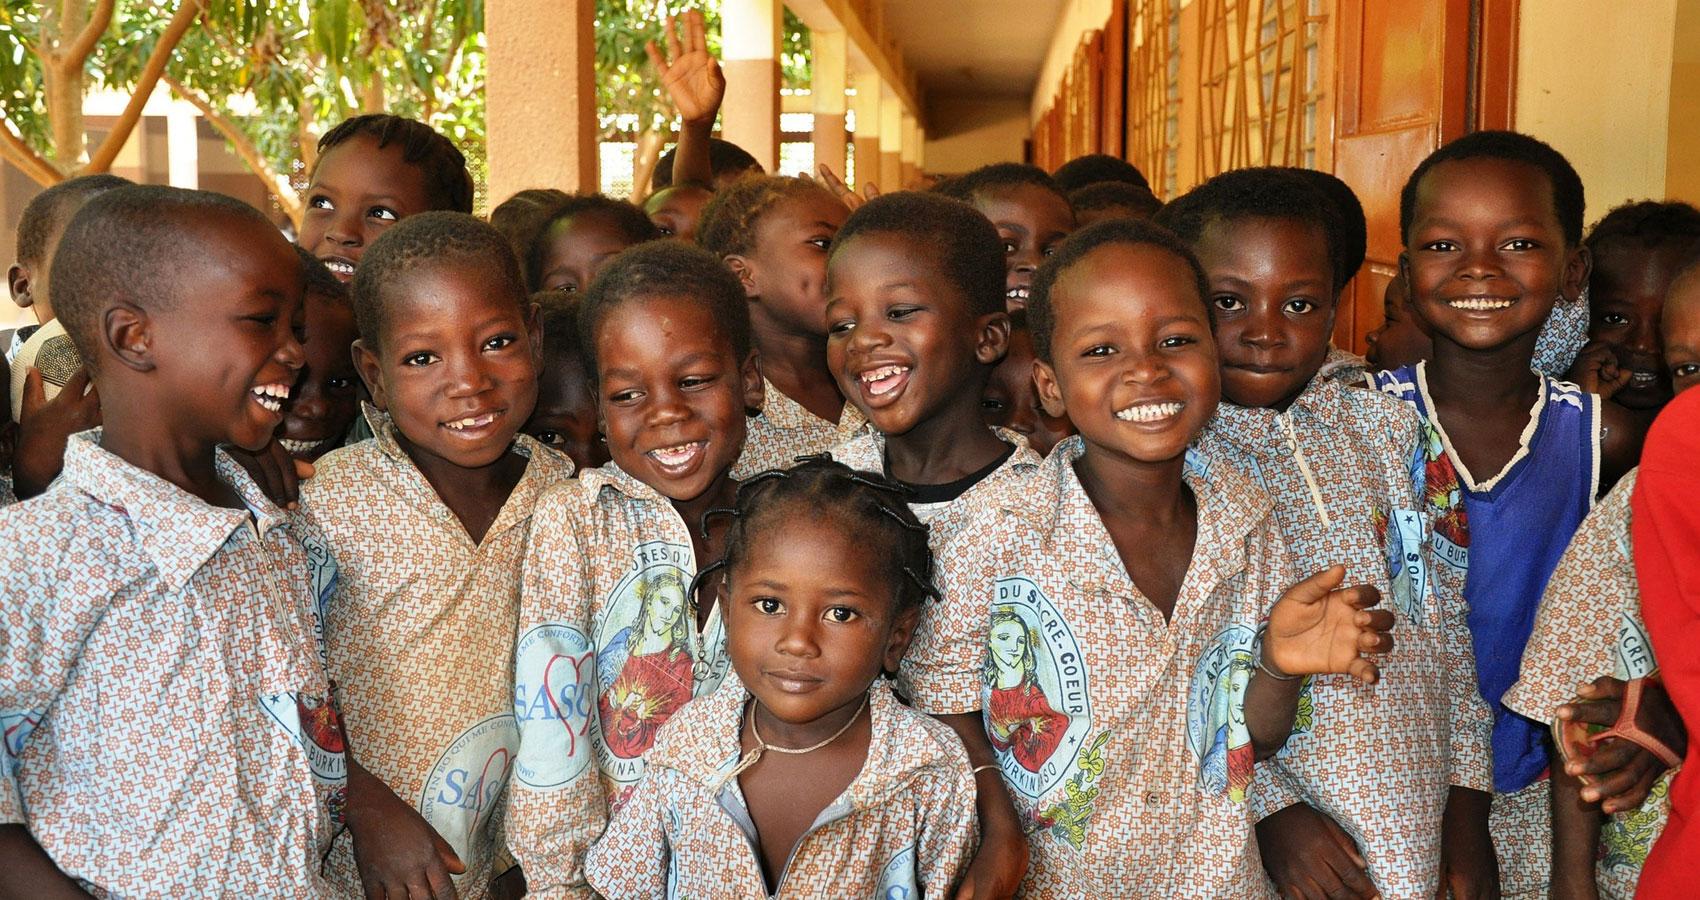 Children of Sankara, poetry written by Mbizo Chirasha at Spillwords.com